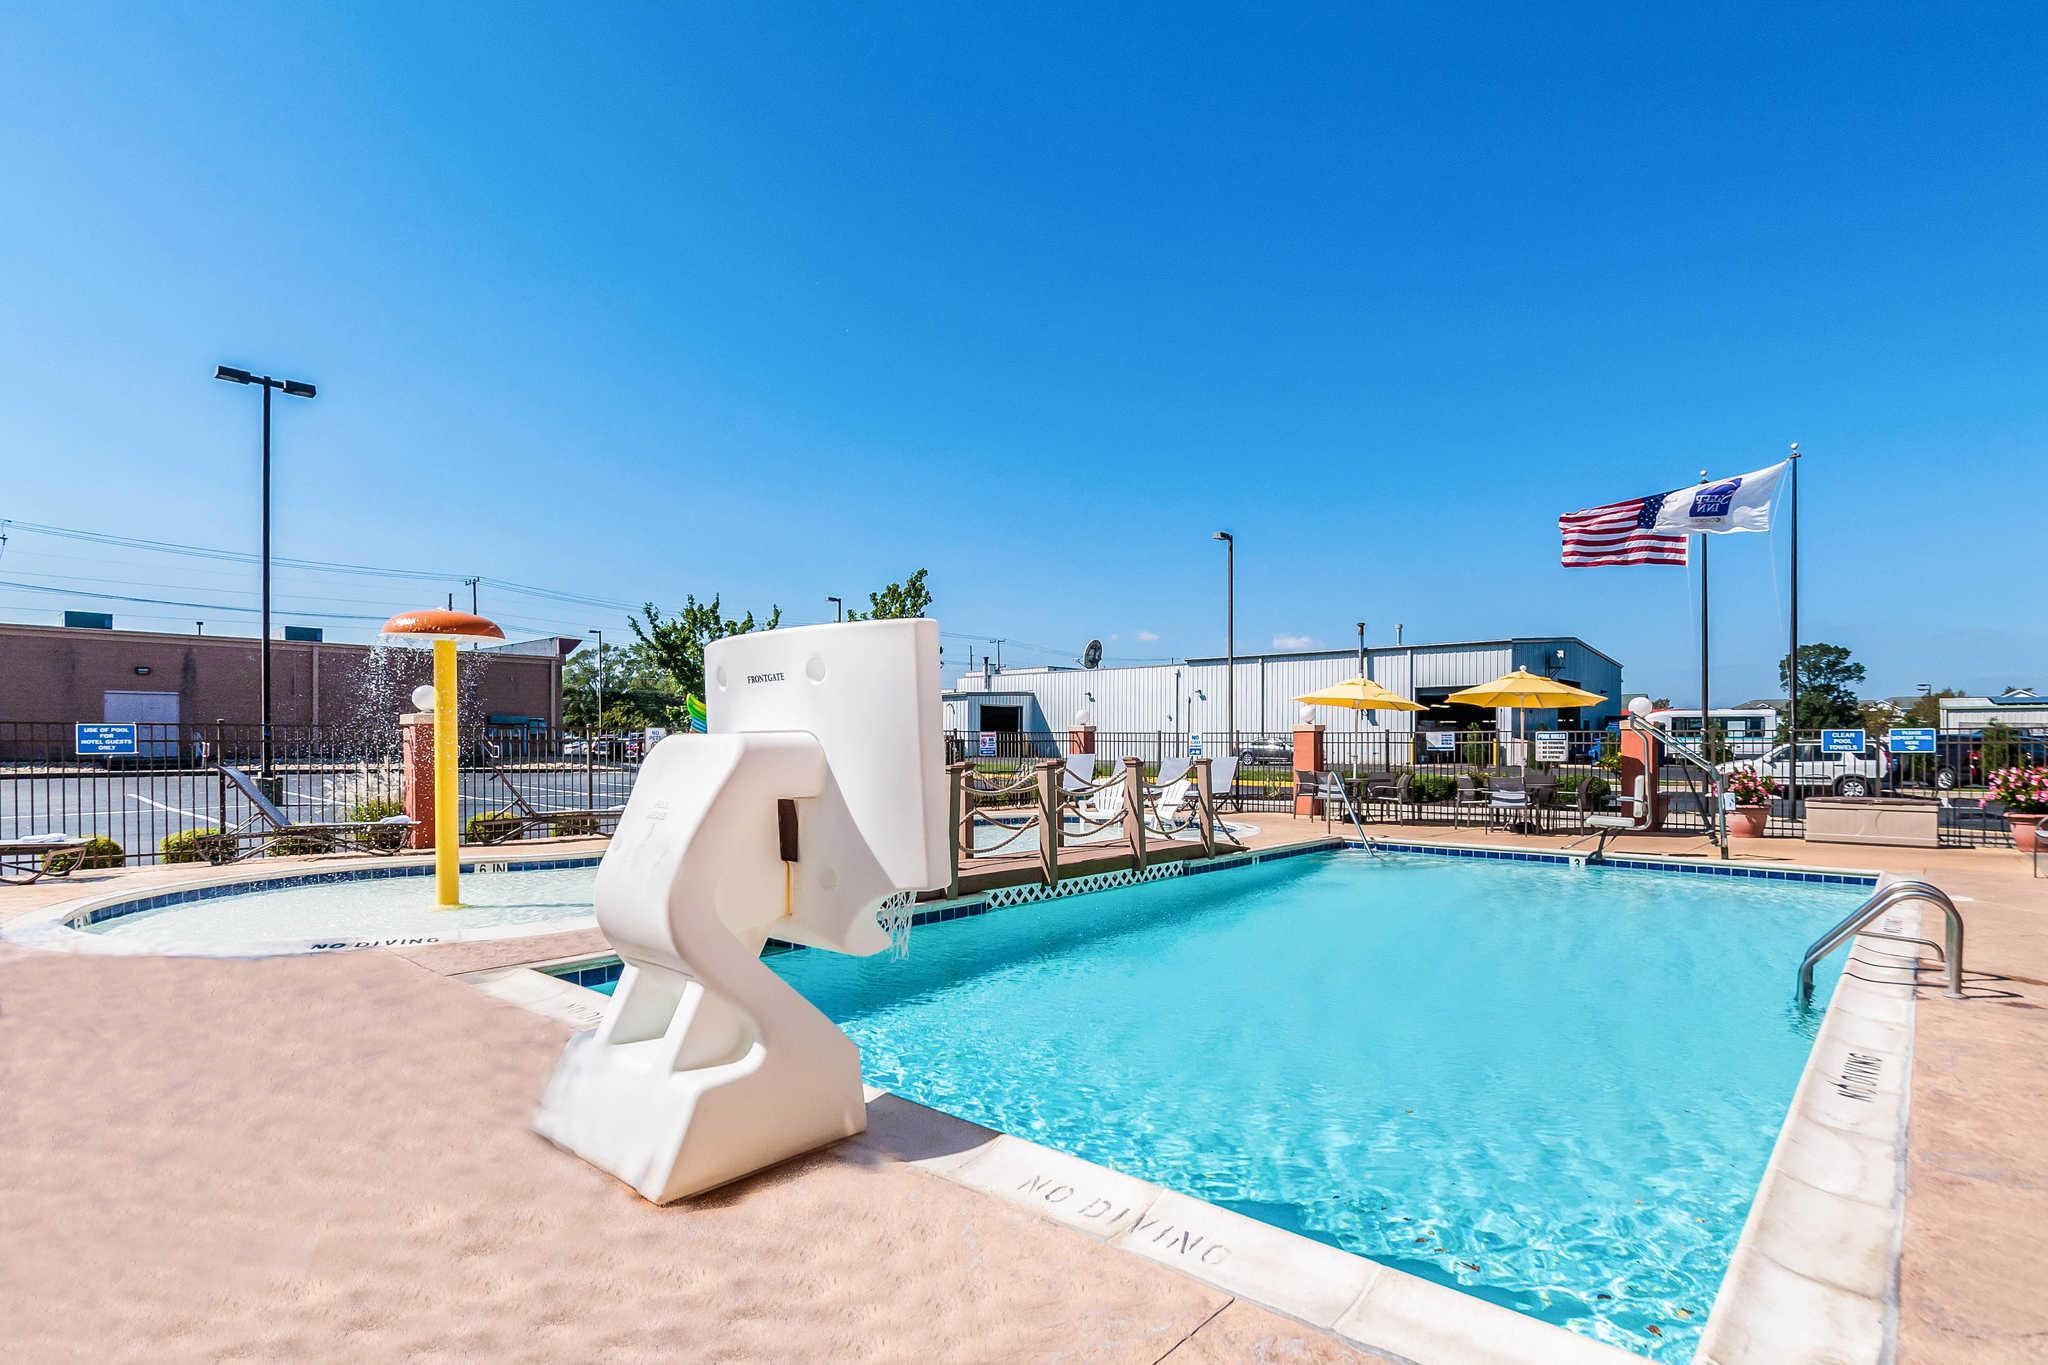 Sleep Inn & Suites Rehoboth Beach image 32